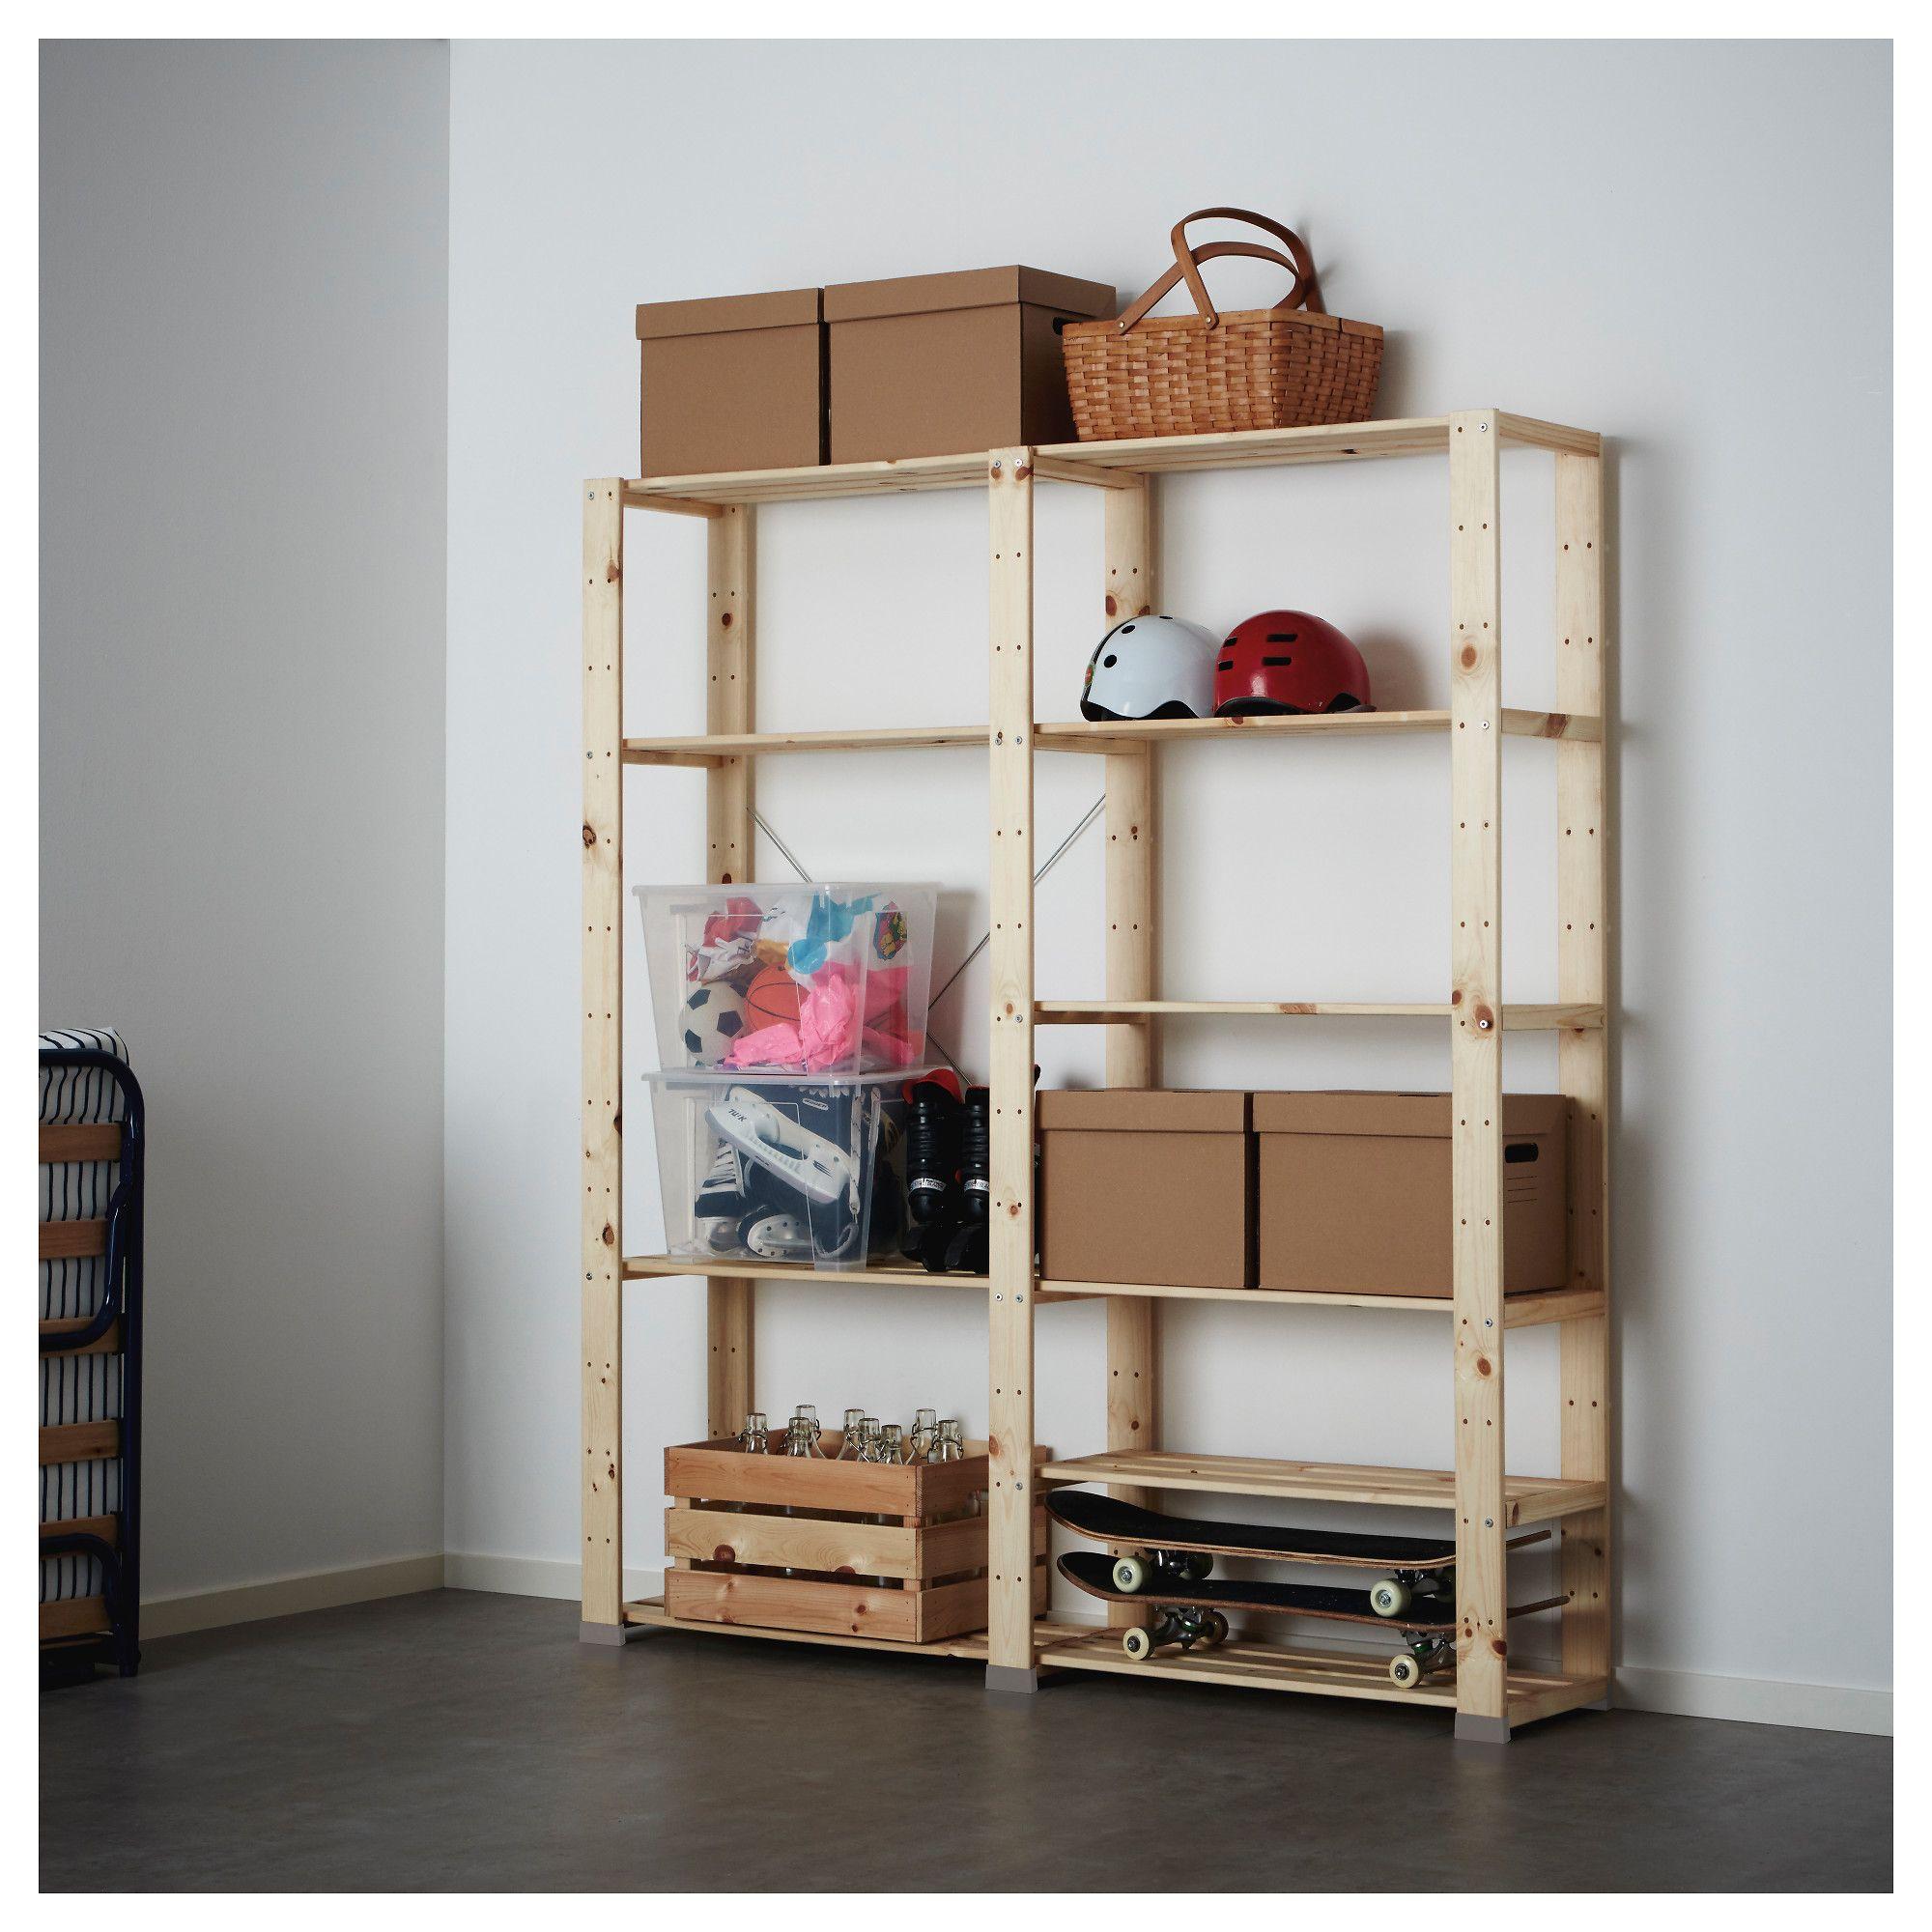 Hejne 2 Section Shelving Unit Softwood 60 5 8x12 1 4x67 3 8 Ikea Shelving Unit Shelving Ikea Hejne